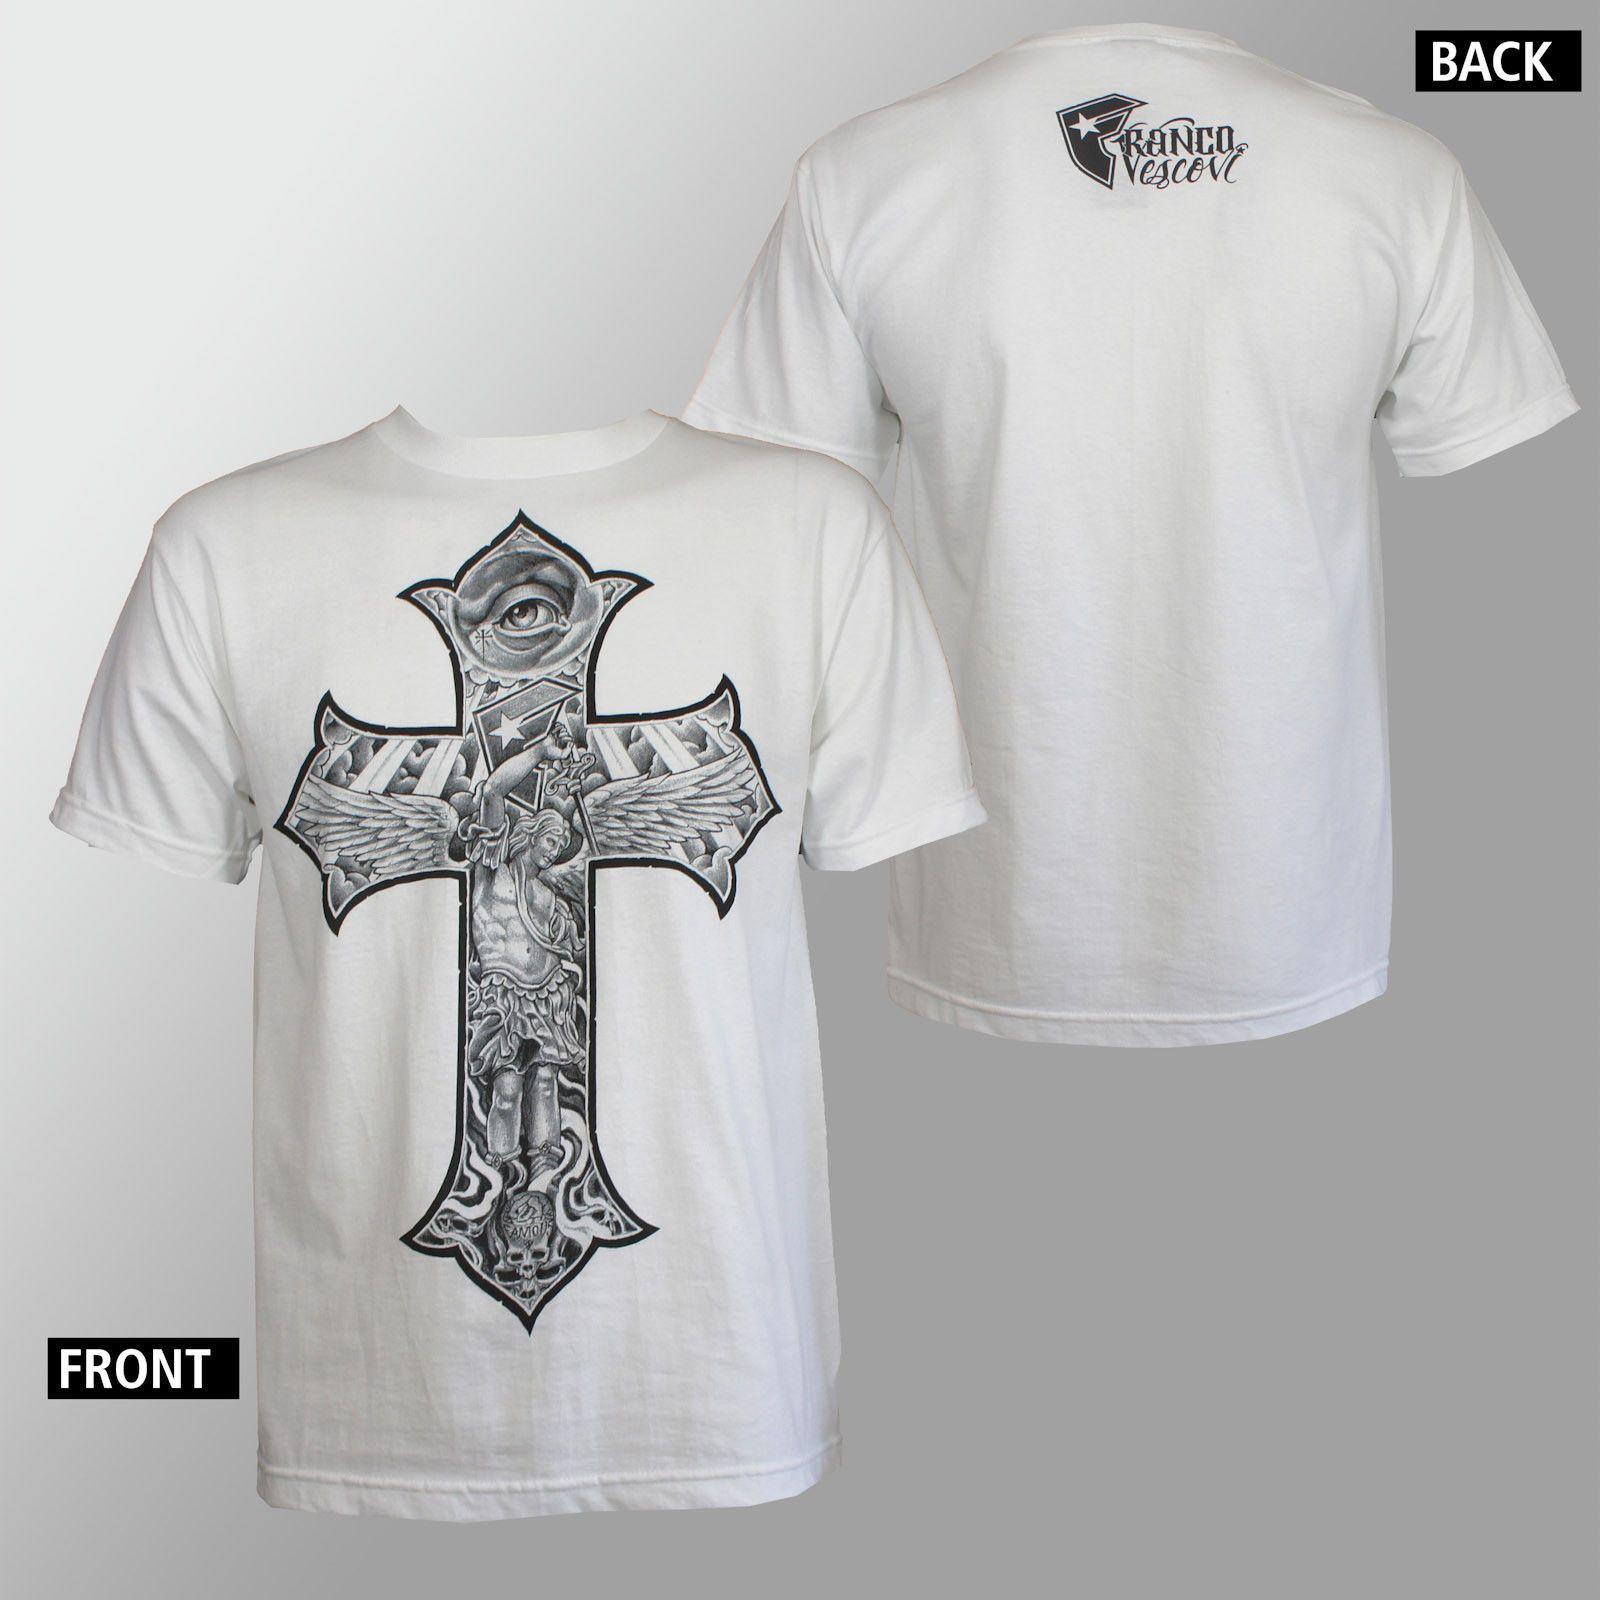 f24bcc5eb Famous Stars & Straps Franco Vescovi Tattoo Rise Above White T Shirt S 2Xl  New T Shirt Men Boy Custom Short Sleeve XXXL Couple Purchase T Shirts Silly  T ...